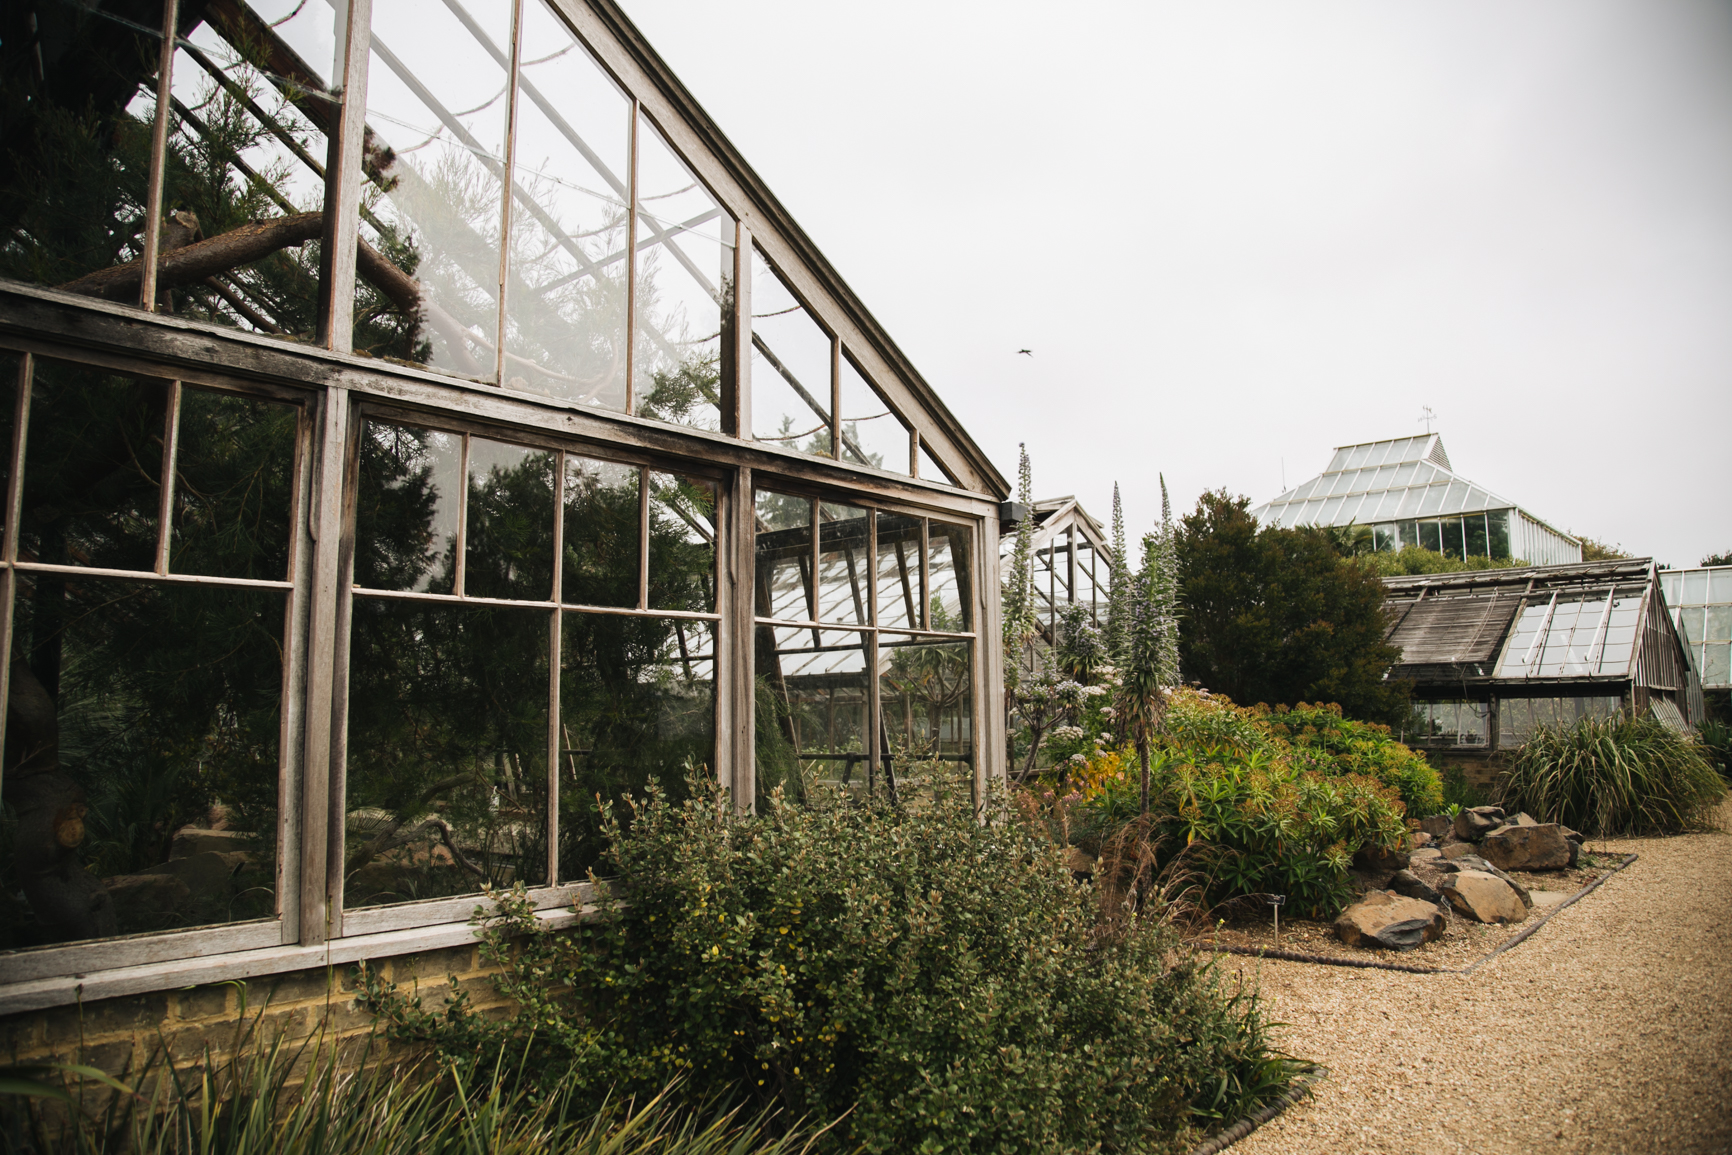 Jardin-botanique-universite-de-cambridge-travel.jpg